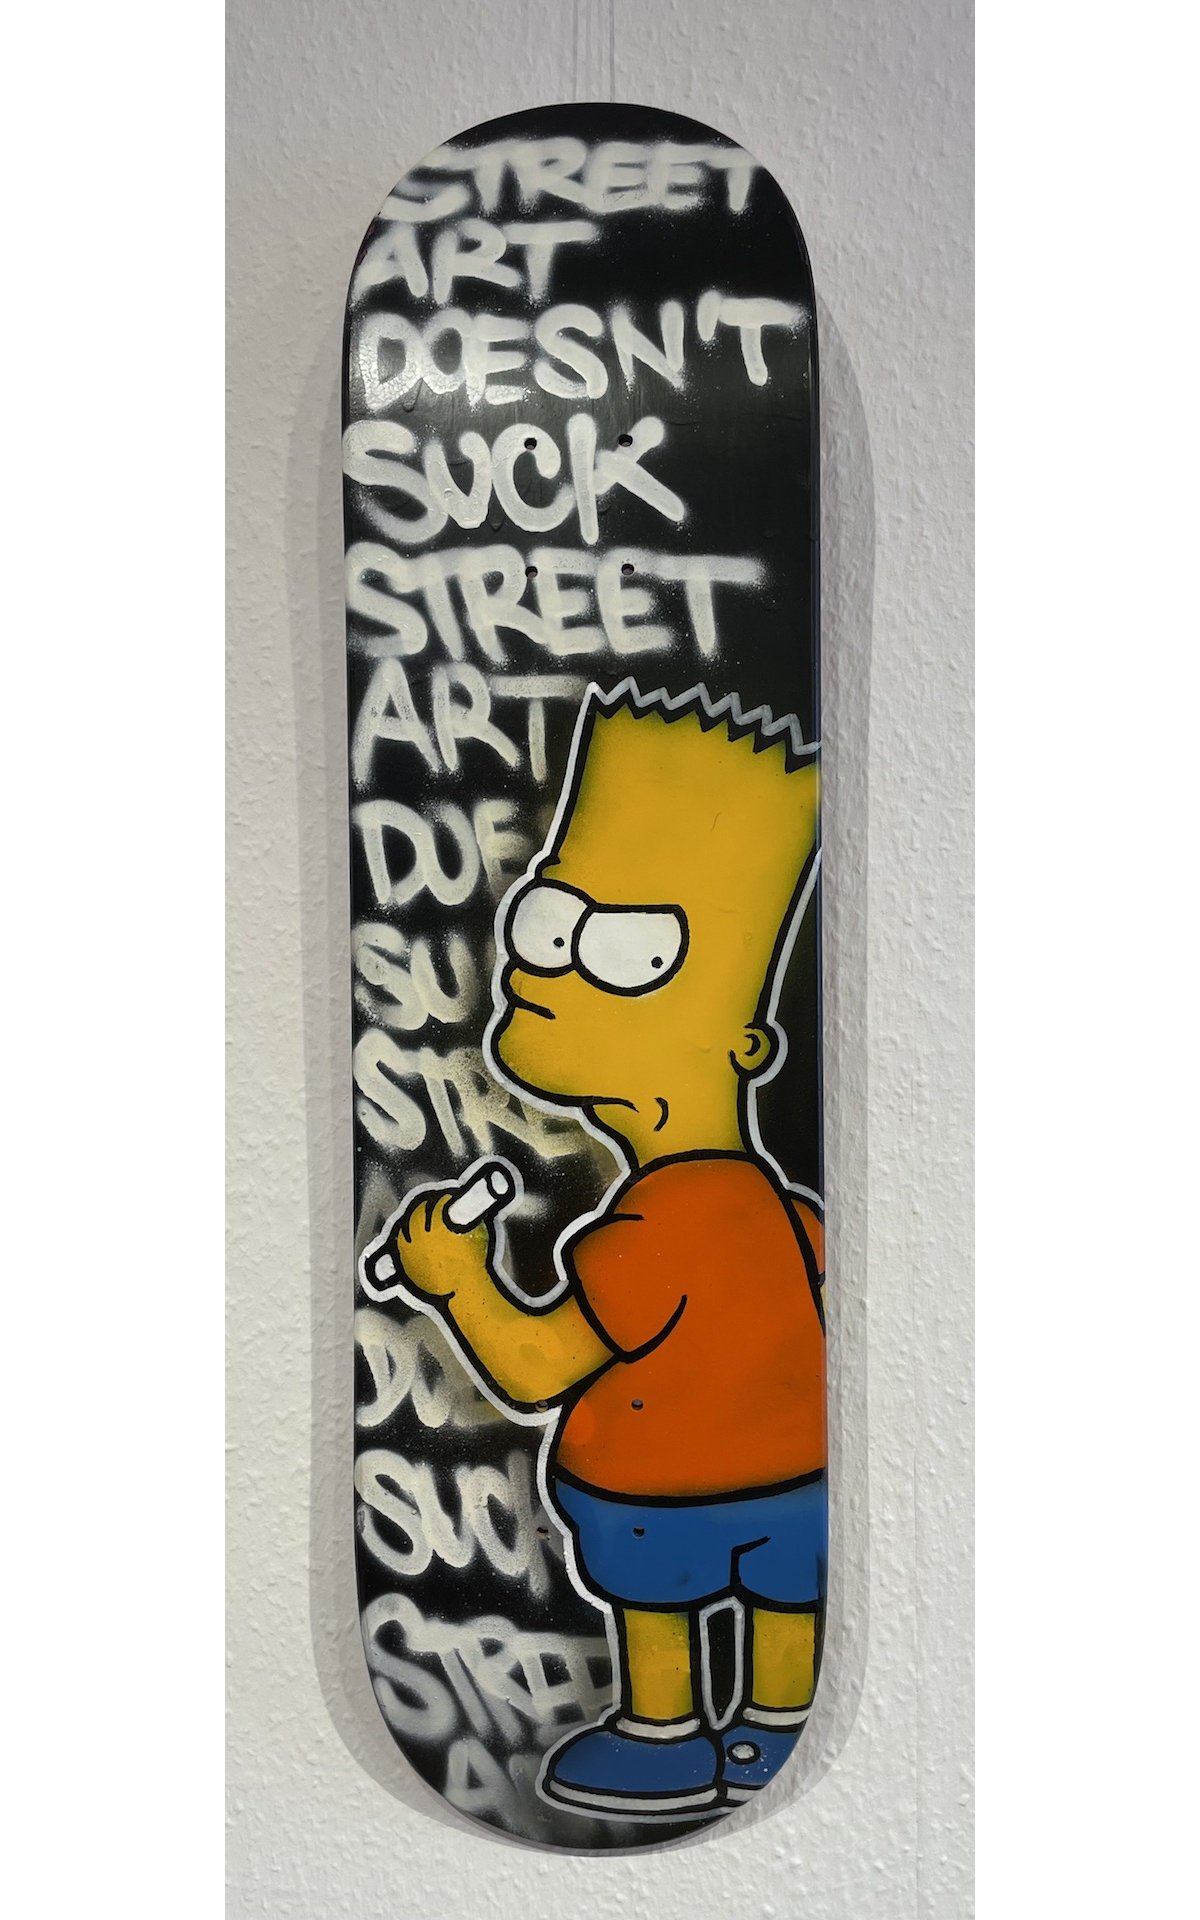 bart-simpson-street-art-dosent-suck-skateart-dopedautm-streetart-gallery-hamburg-popstreetshop